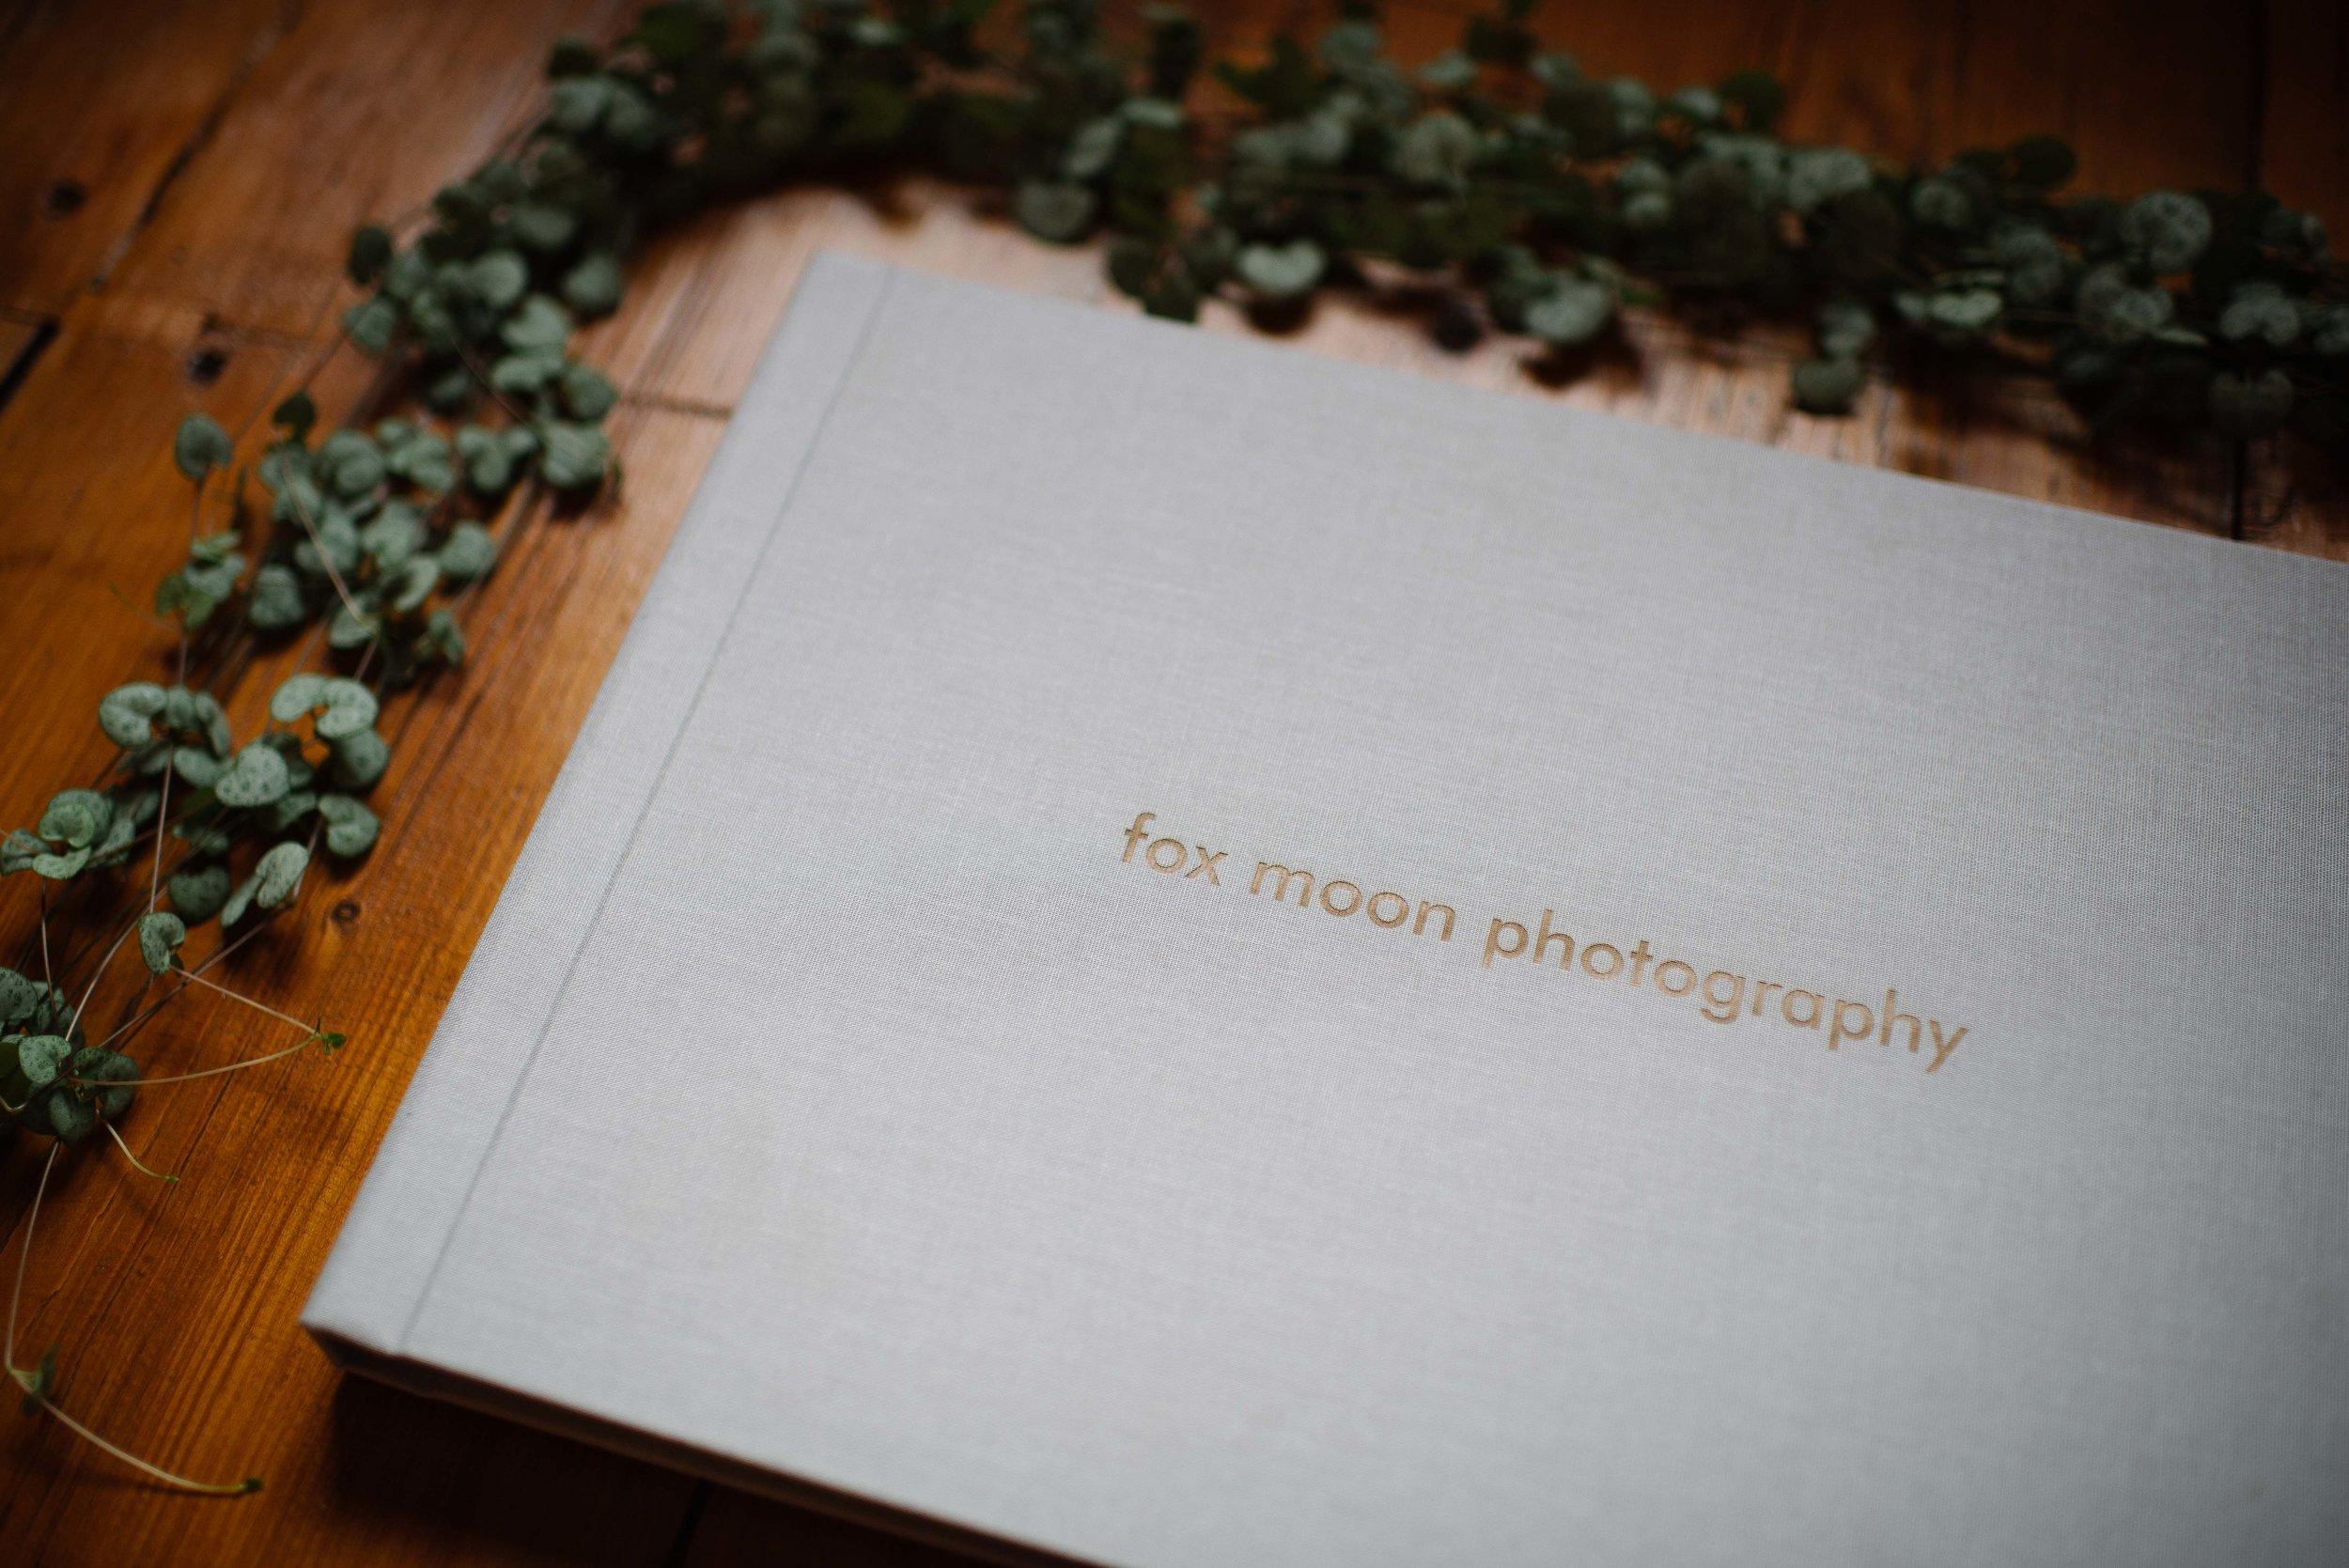 FoxMoonPhotography-5.jpg